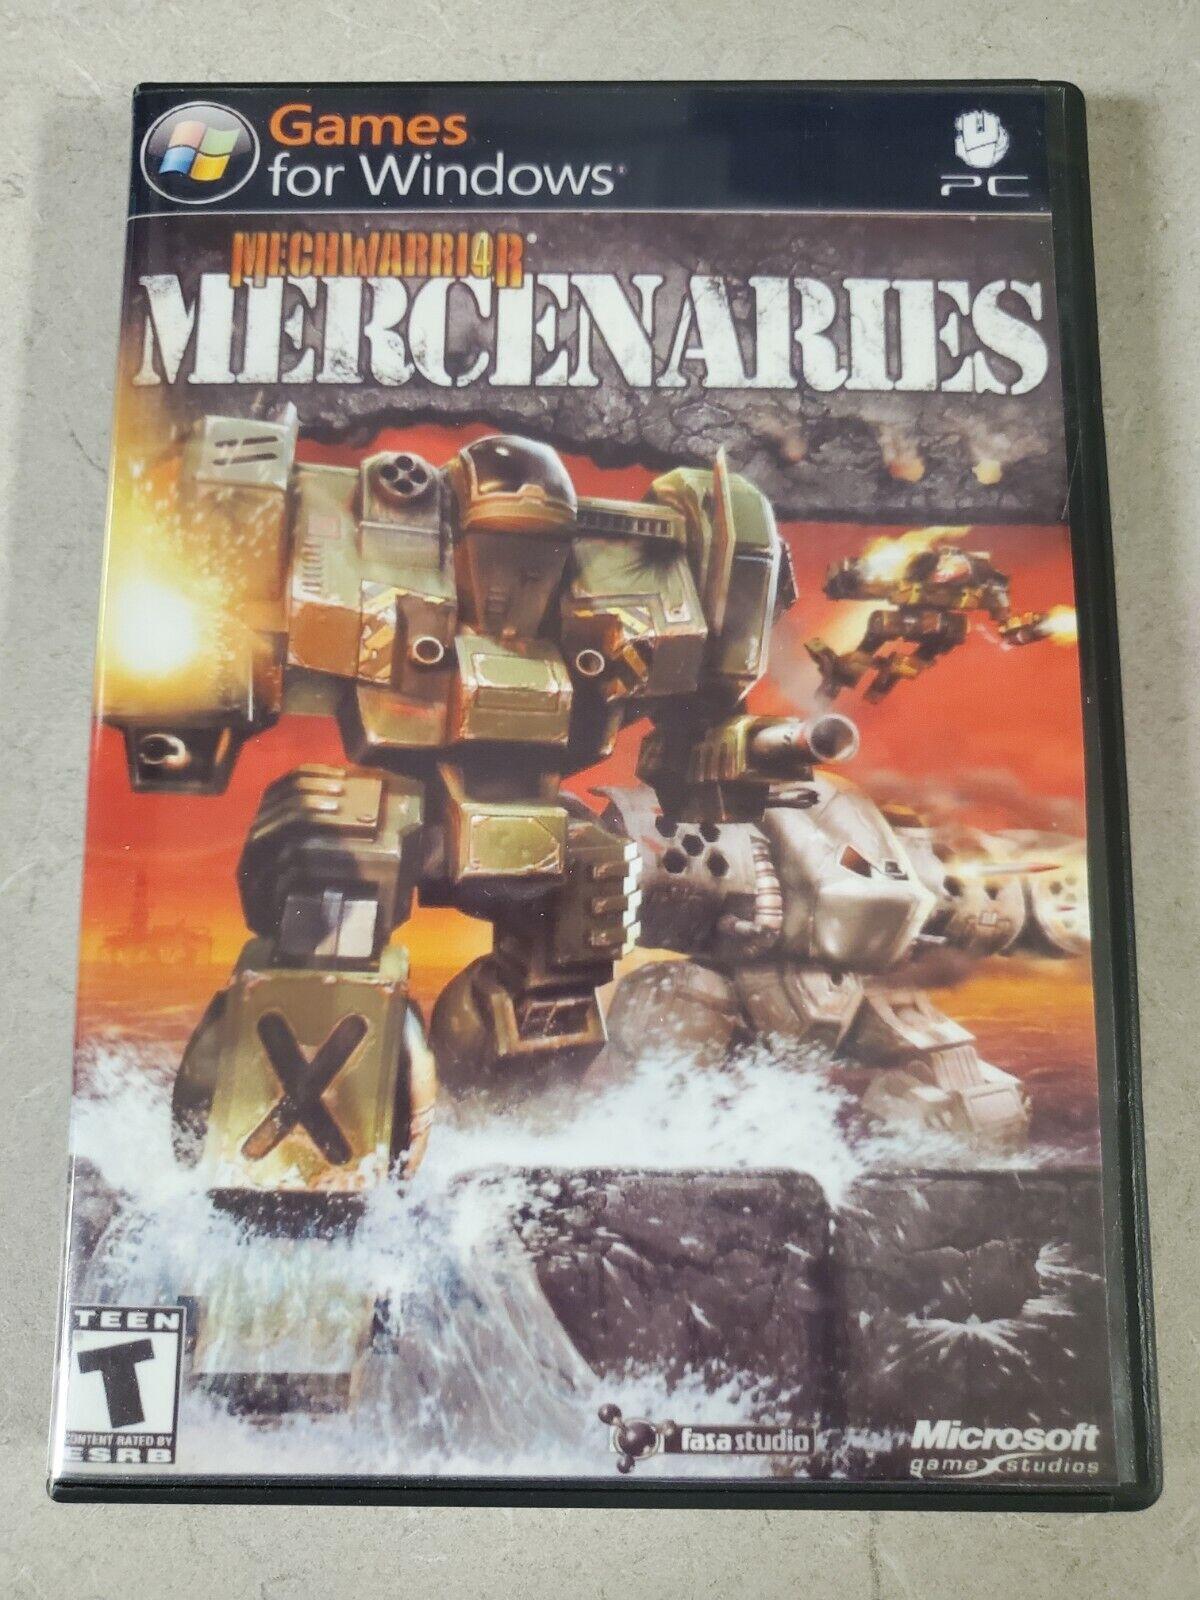 Image 1 - MechWarrior4 Mercenaries PC Game in custon dvd case Windows 98/ME/2000